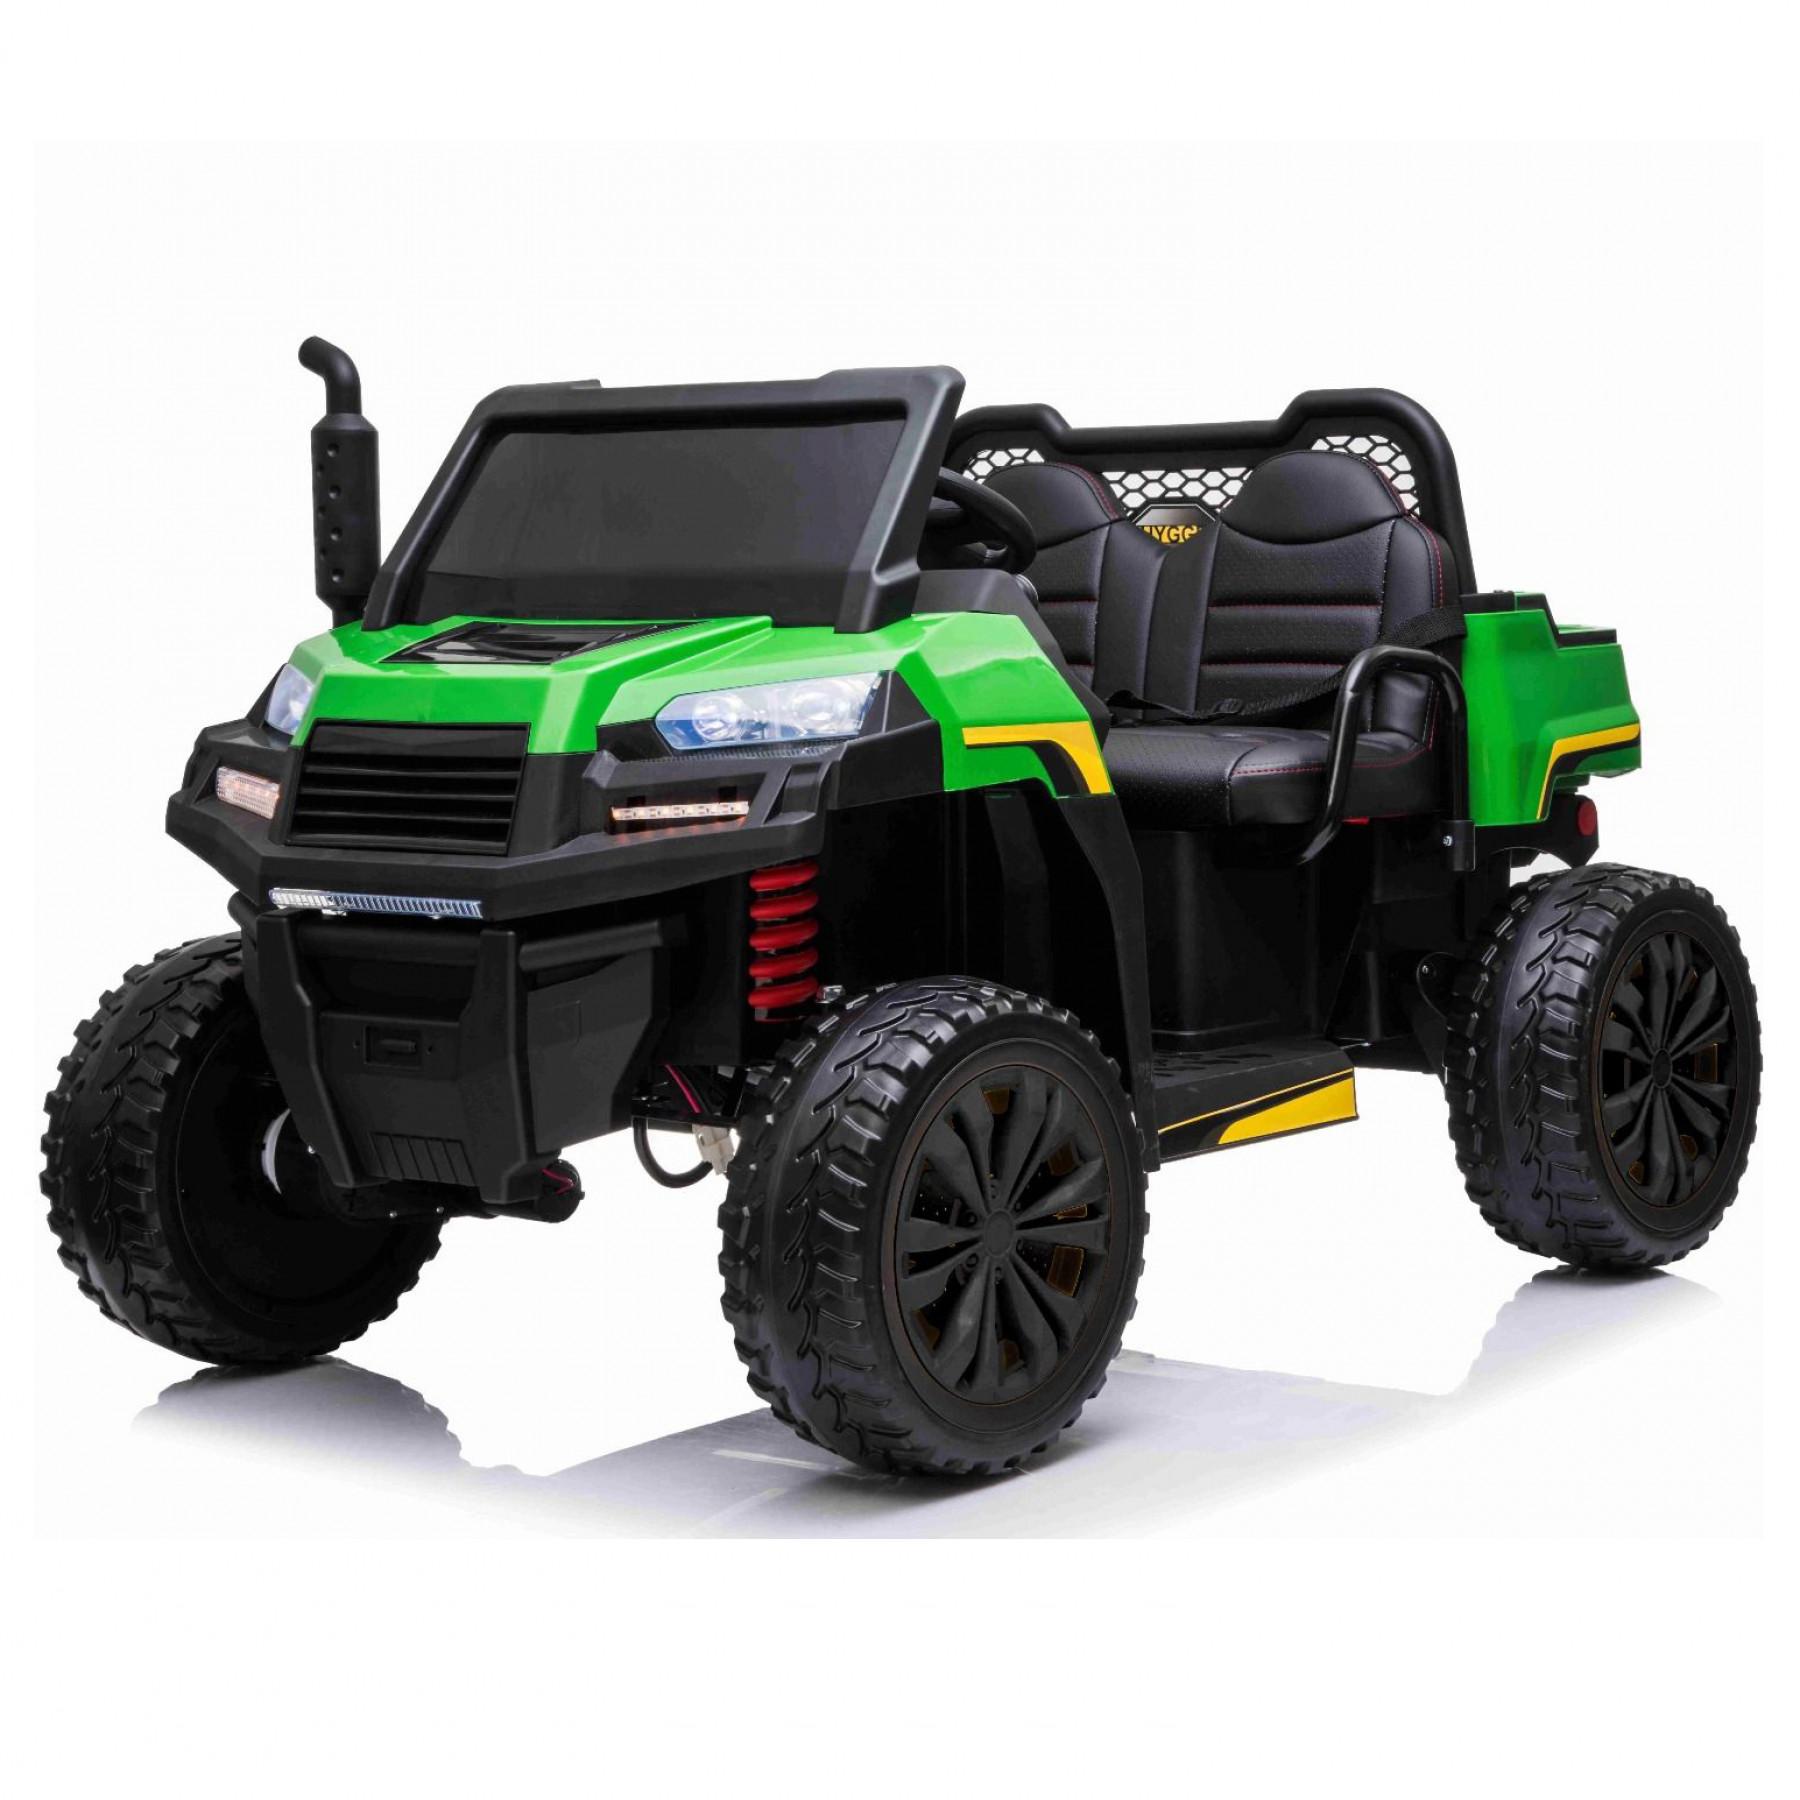 Xtreme BIG 24V 4WD Ride on Utility Truck UTV Jeep Green